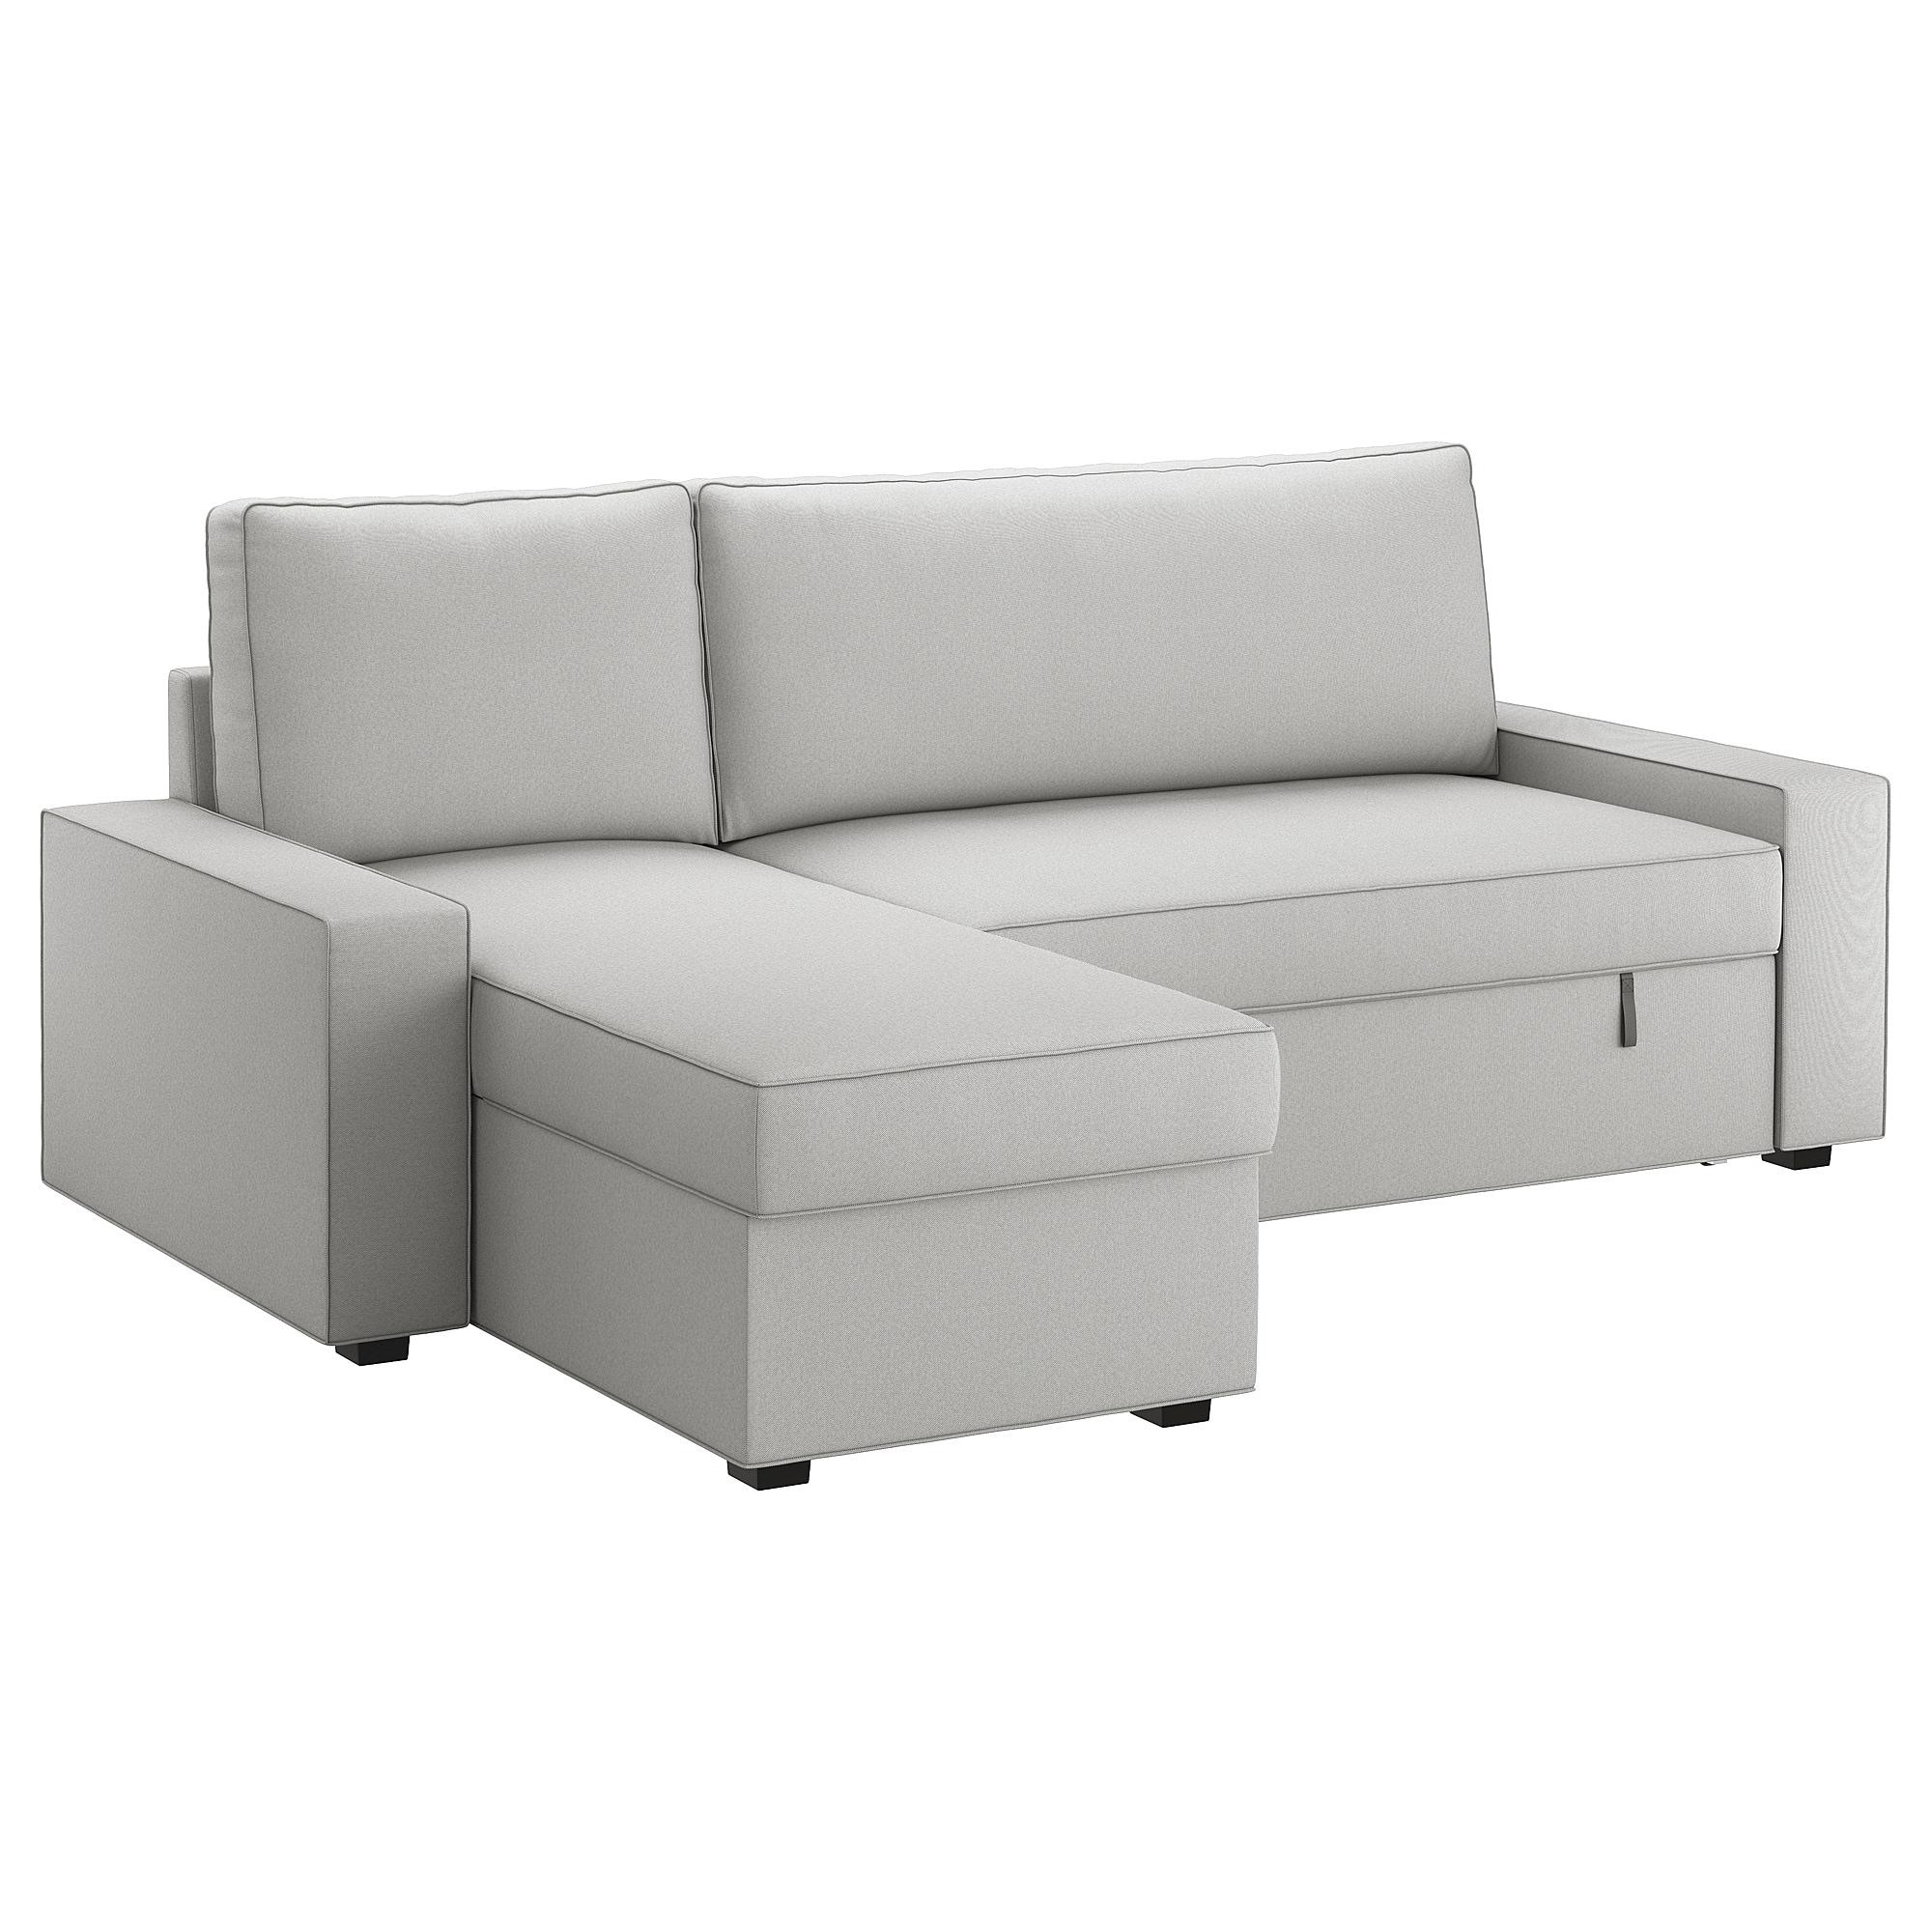 Sofa Chaise Longue Cama Fmdf Vilasund sofà Cama Con Chaiselongue orrsta Gris Claro Ikea